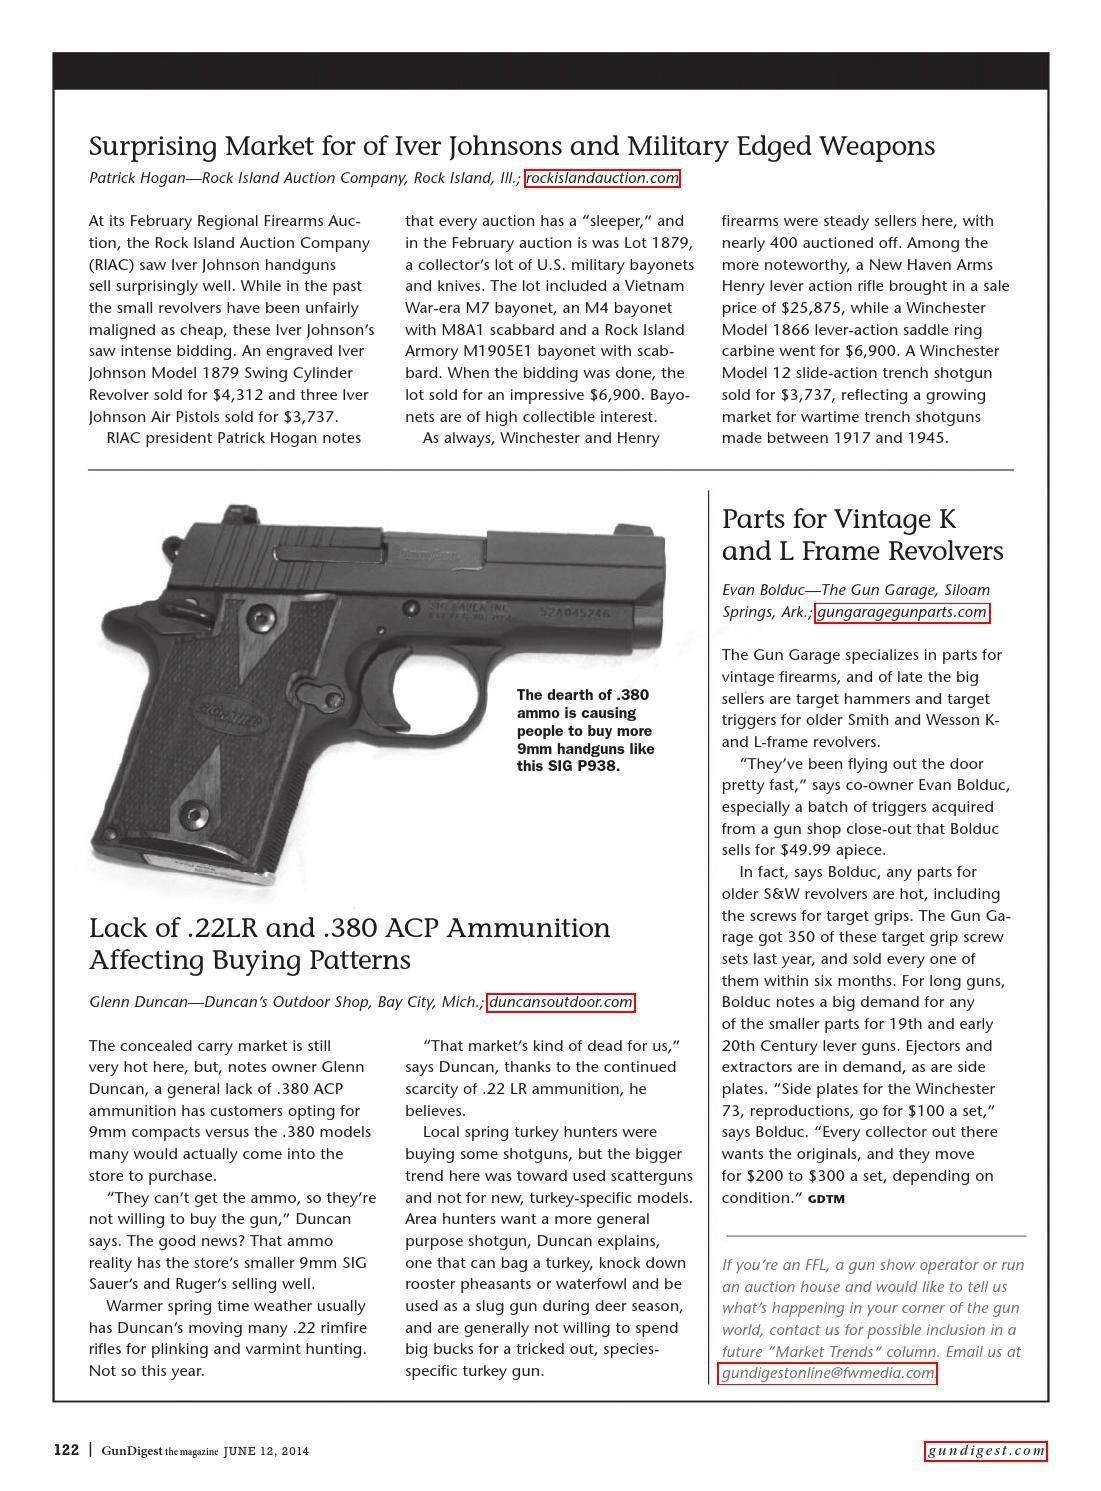 Gun digest june 12, 2014 usa by Sensei - issuu